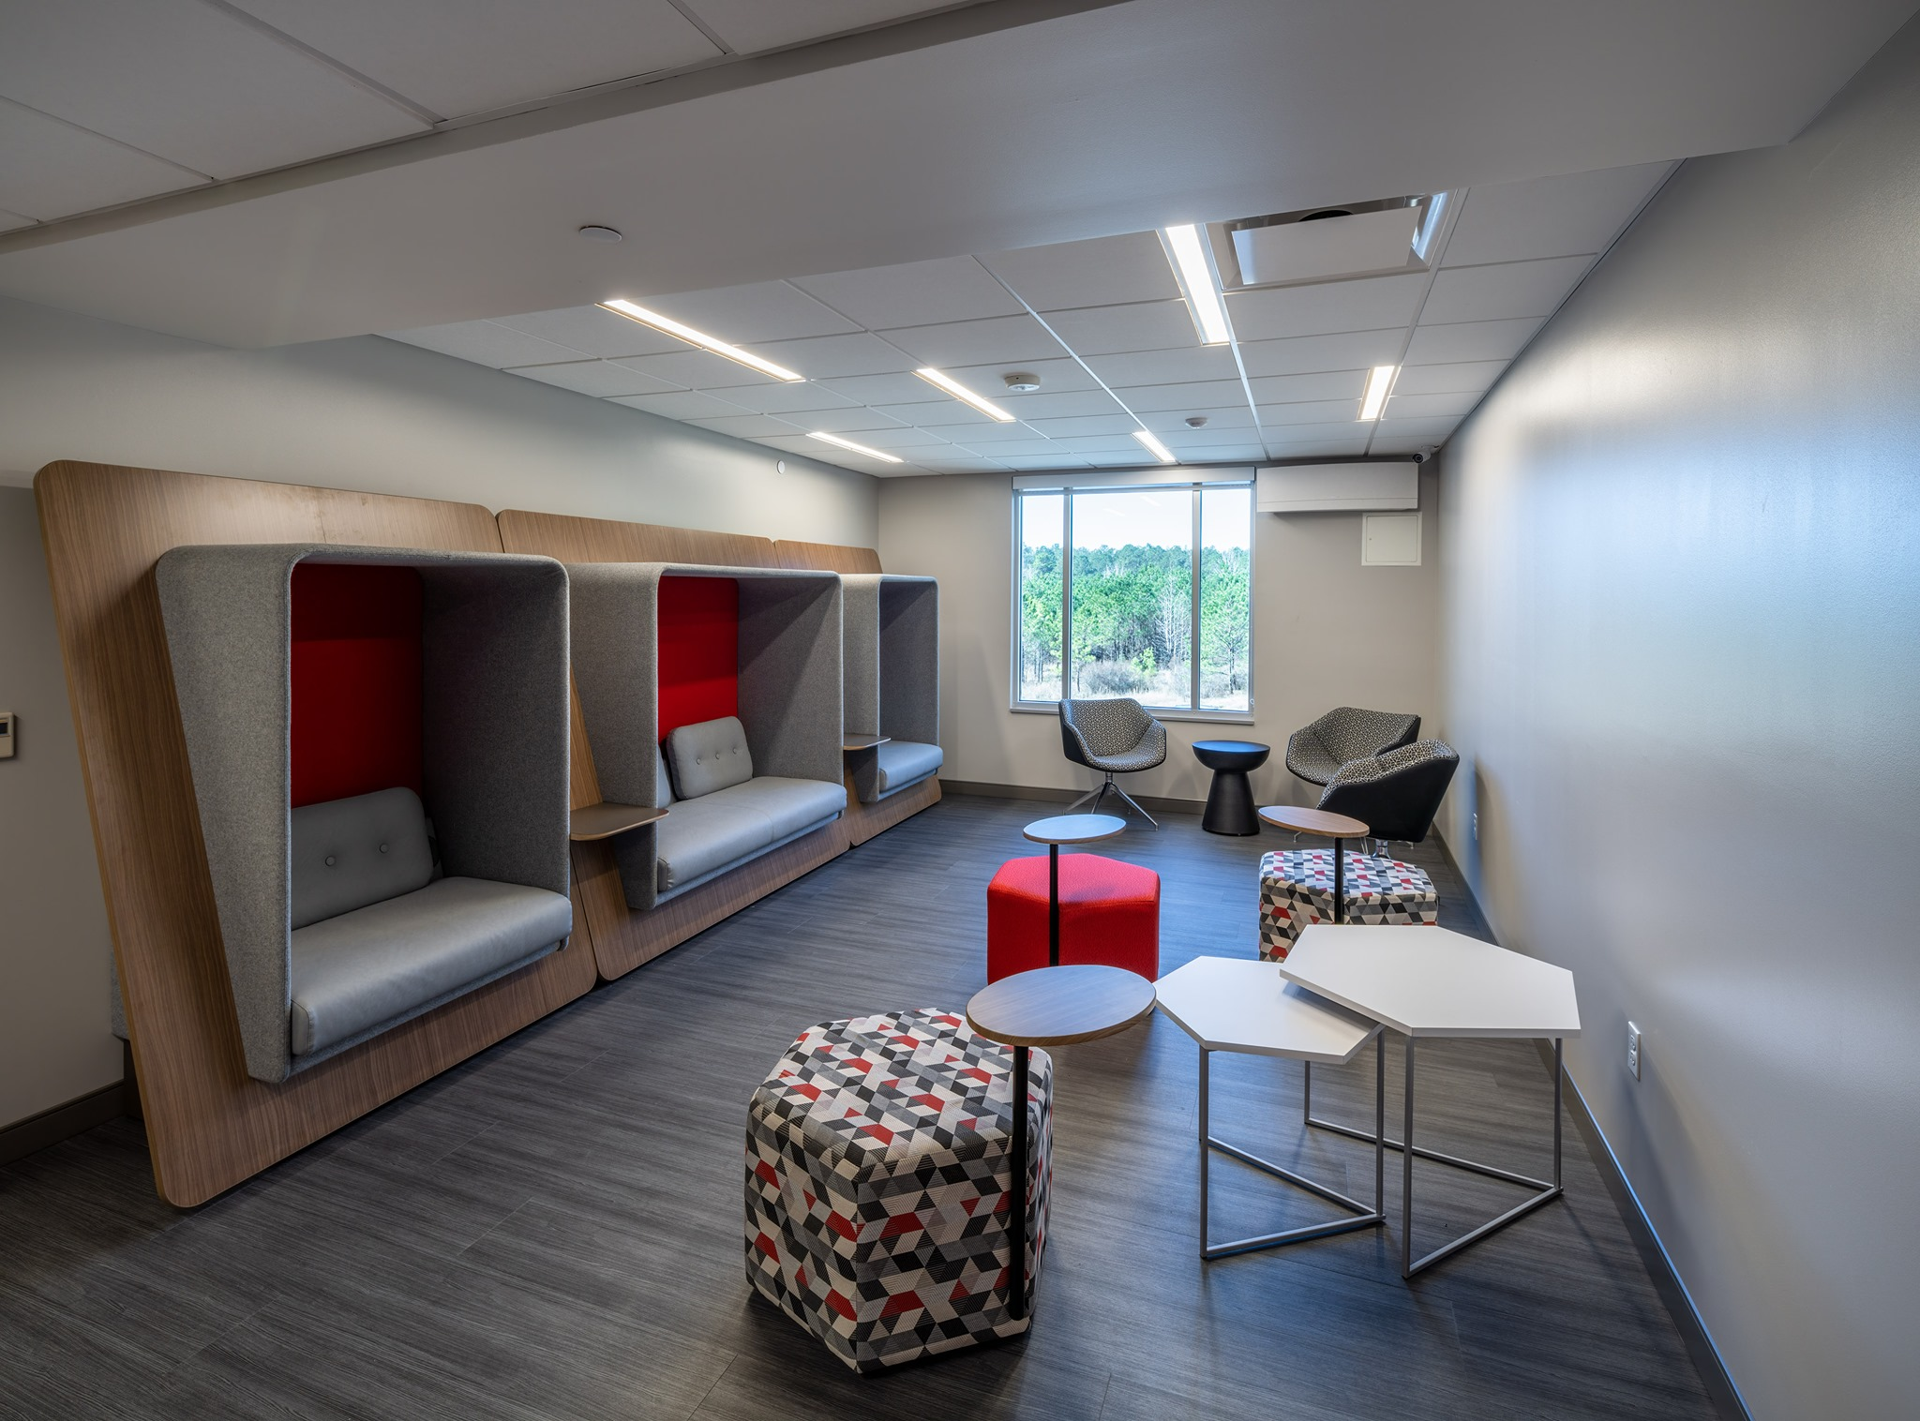 lounge area with modular seating